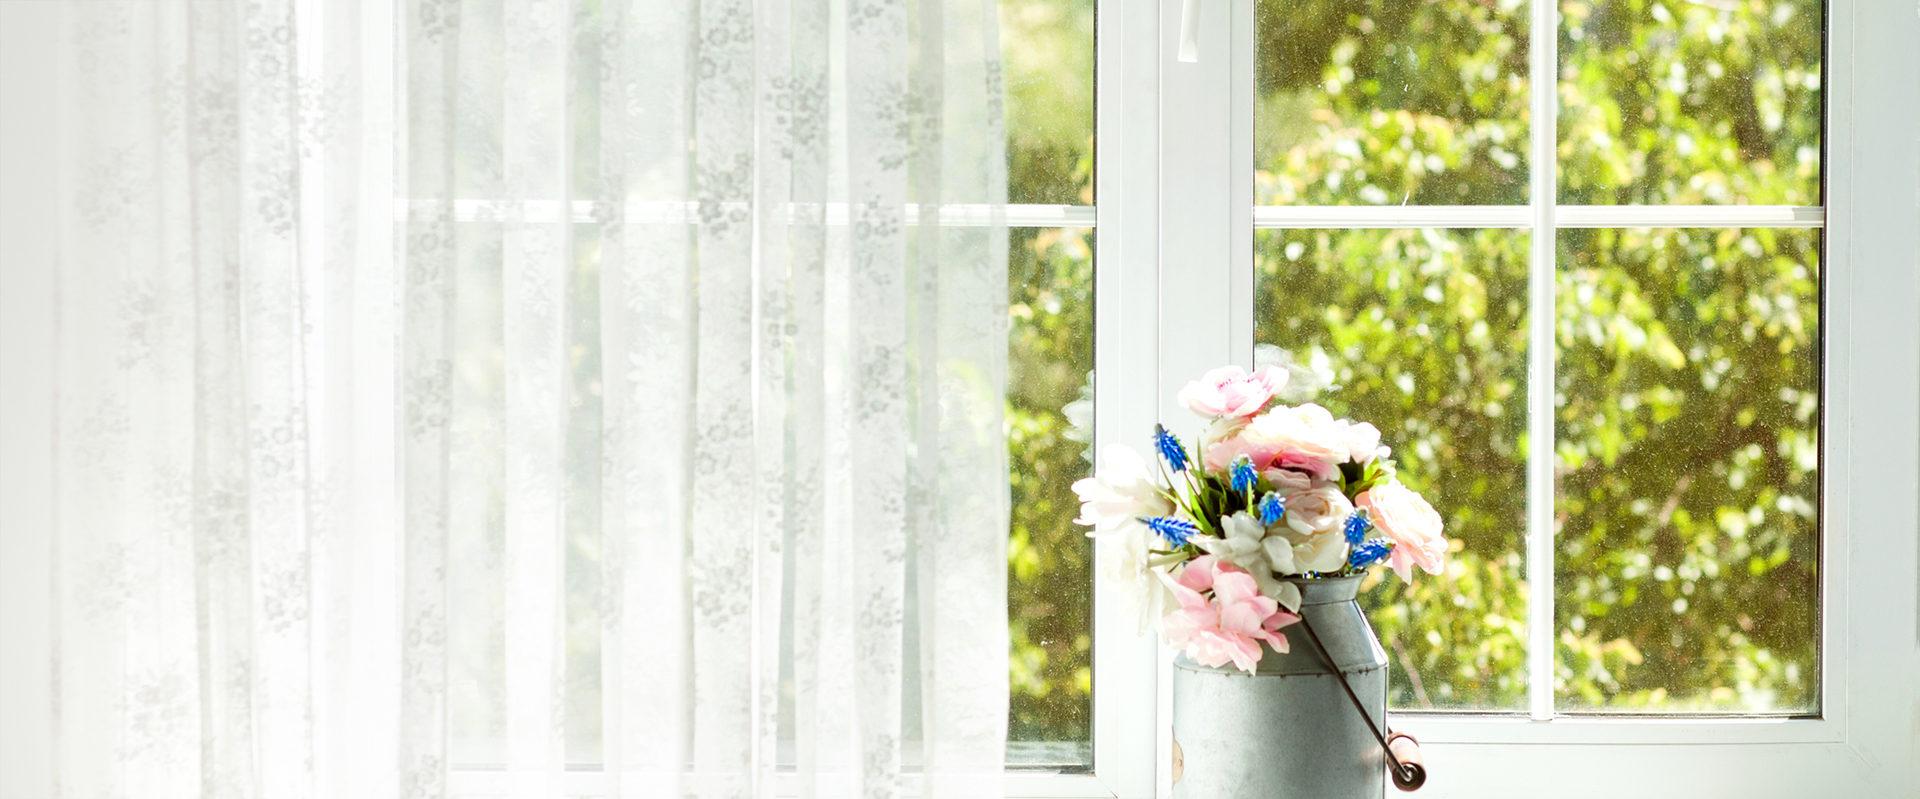 картинка окна на дачу